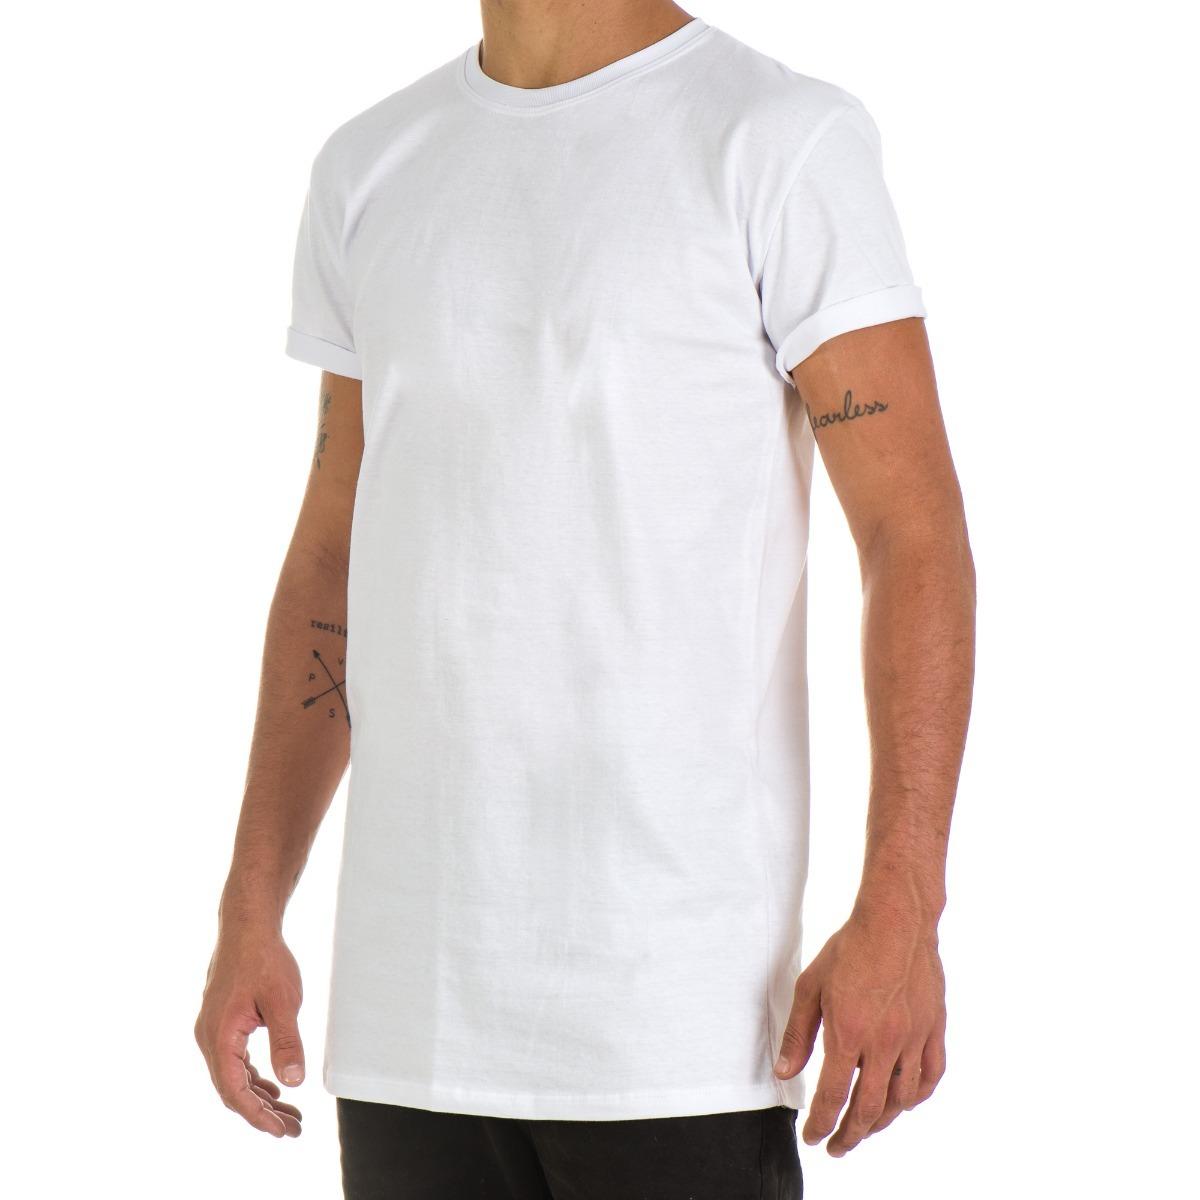 fe3123288 camiseta longline lisa unissex oversized swag basica. Carregando zoom.